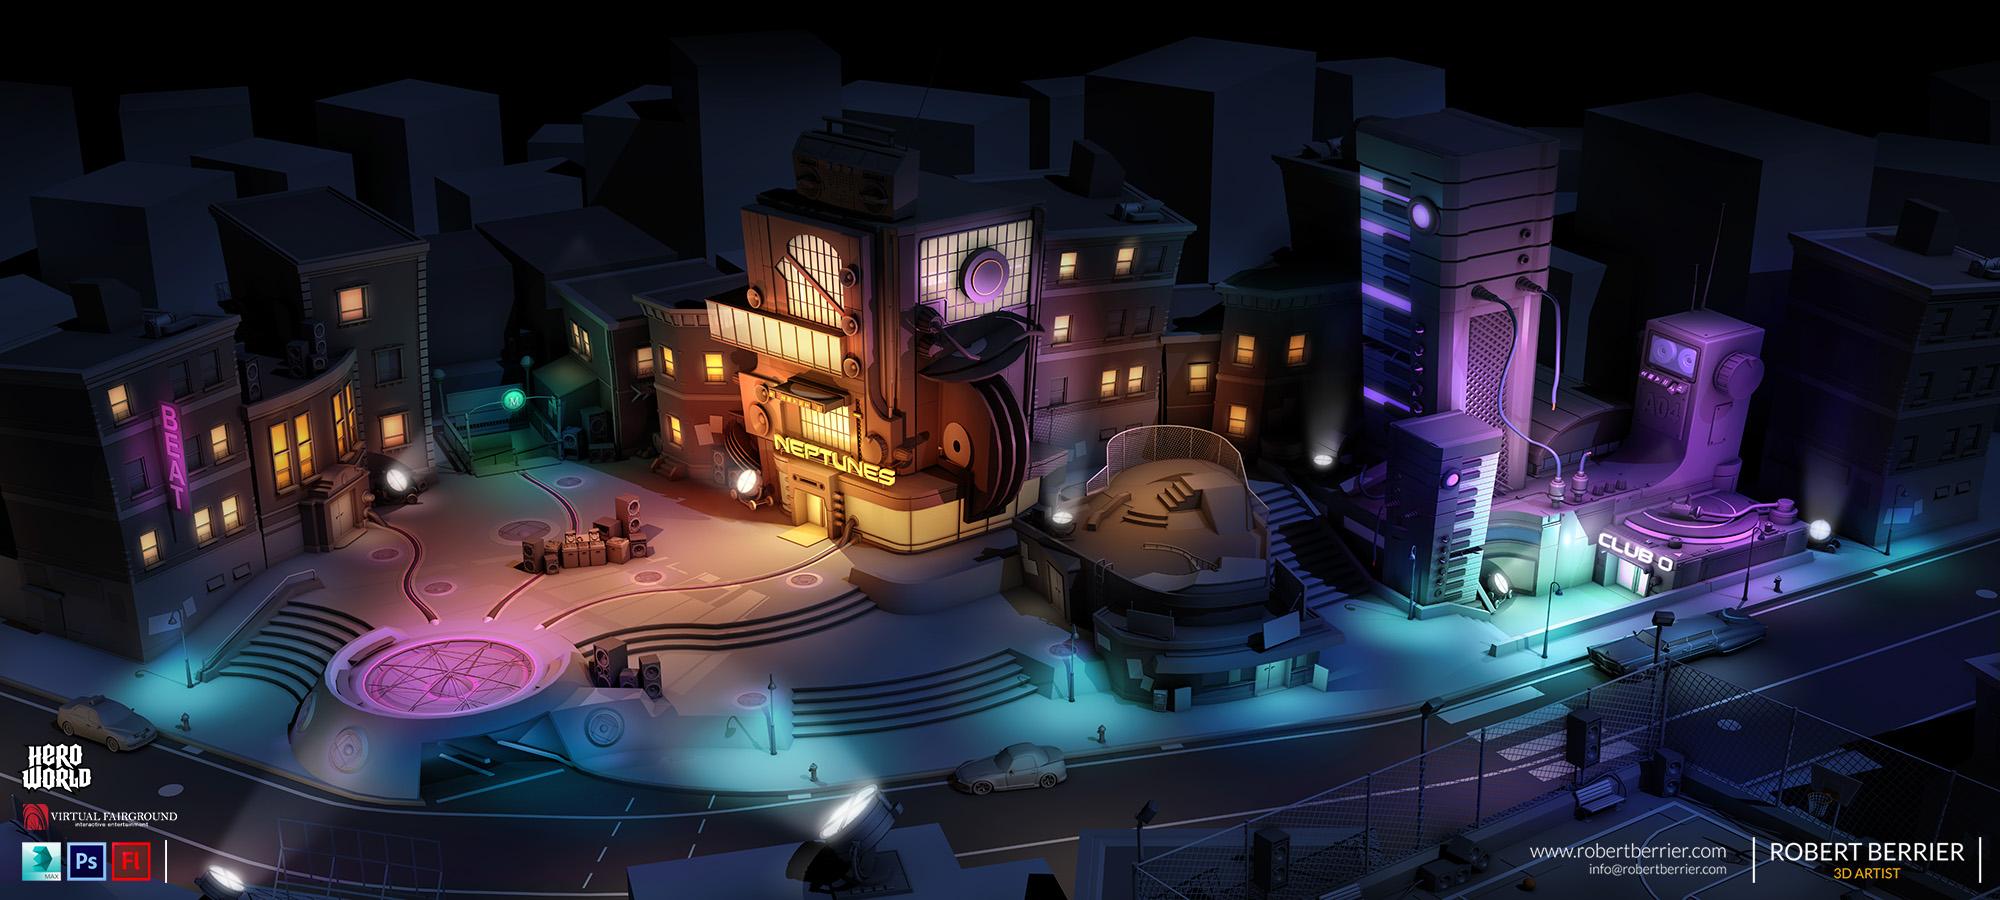 Robert Berrier - Activision - Hero World Street